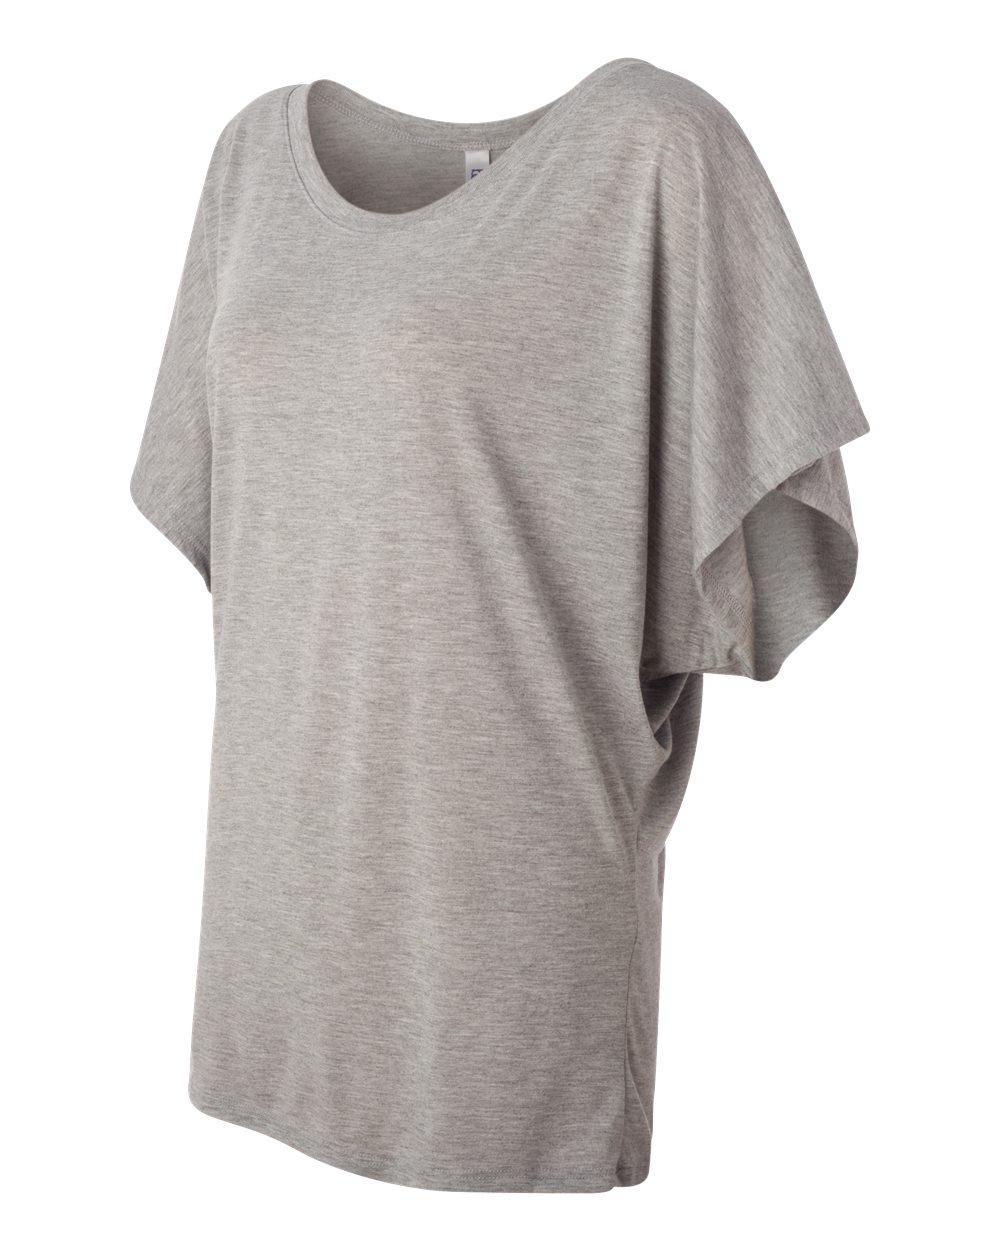 Bella-Canvas-Women-039-s-Flowy-Draped-Sleeve-Dolman-T-Shirt-8821-S-2XL thumbnail 15